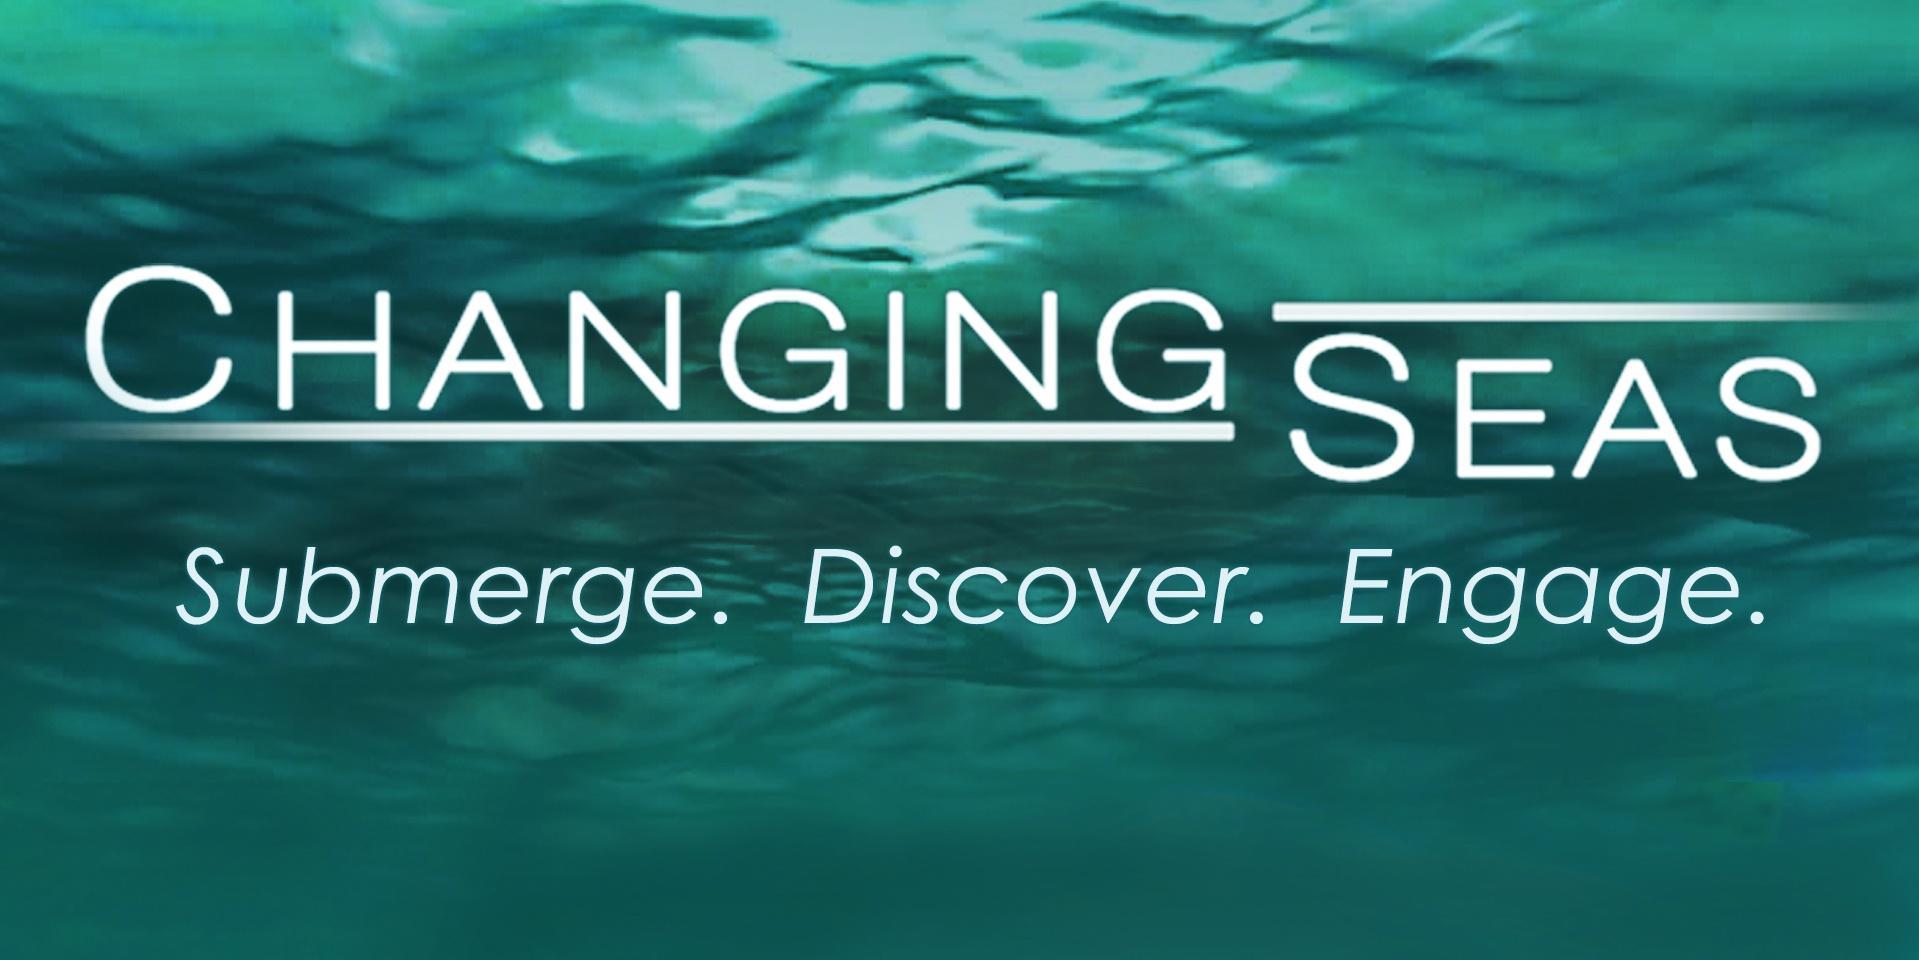 Changing Seas 10th Anniversary